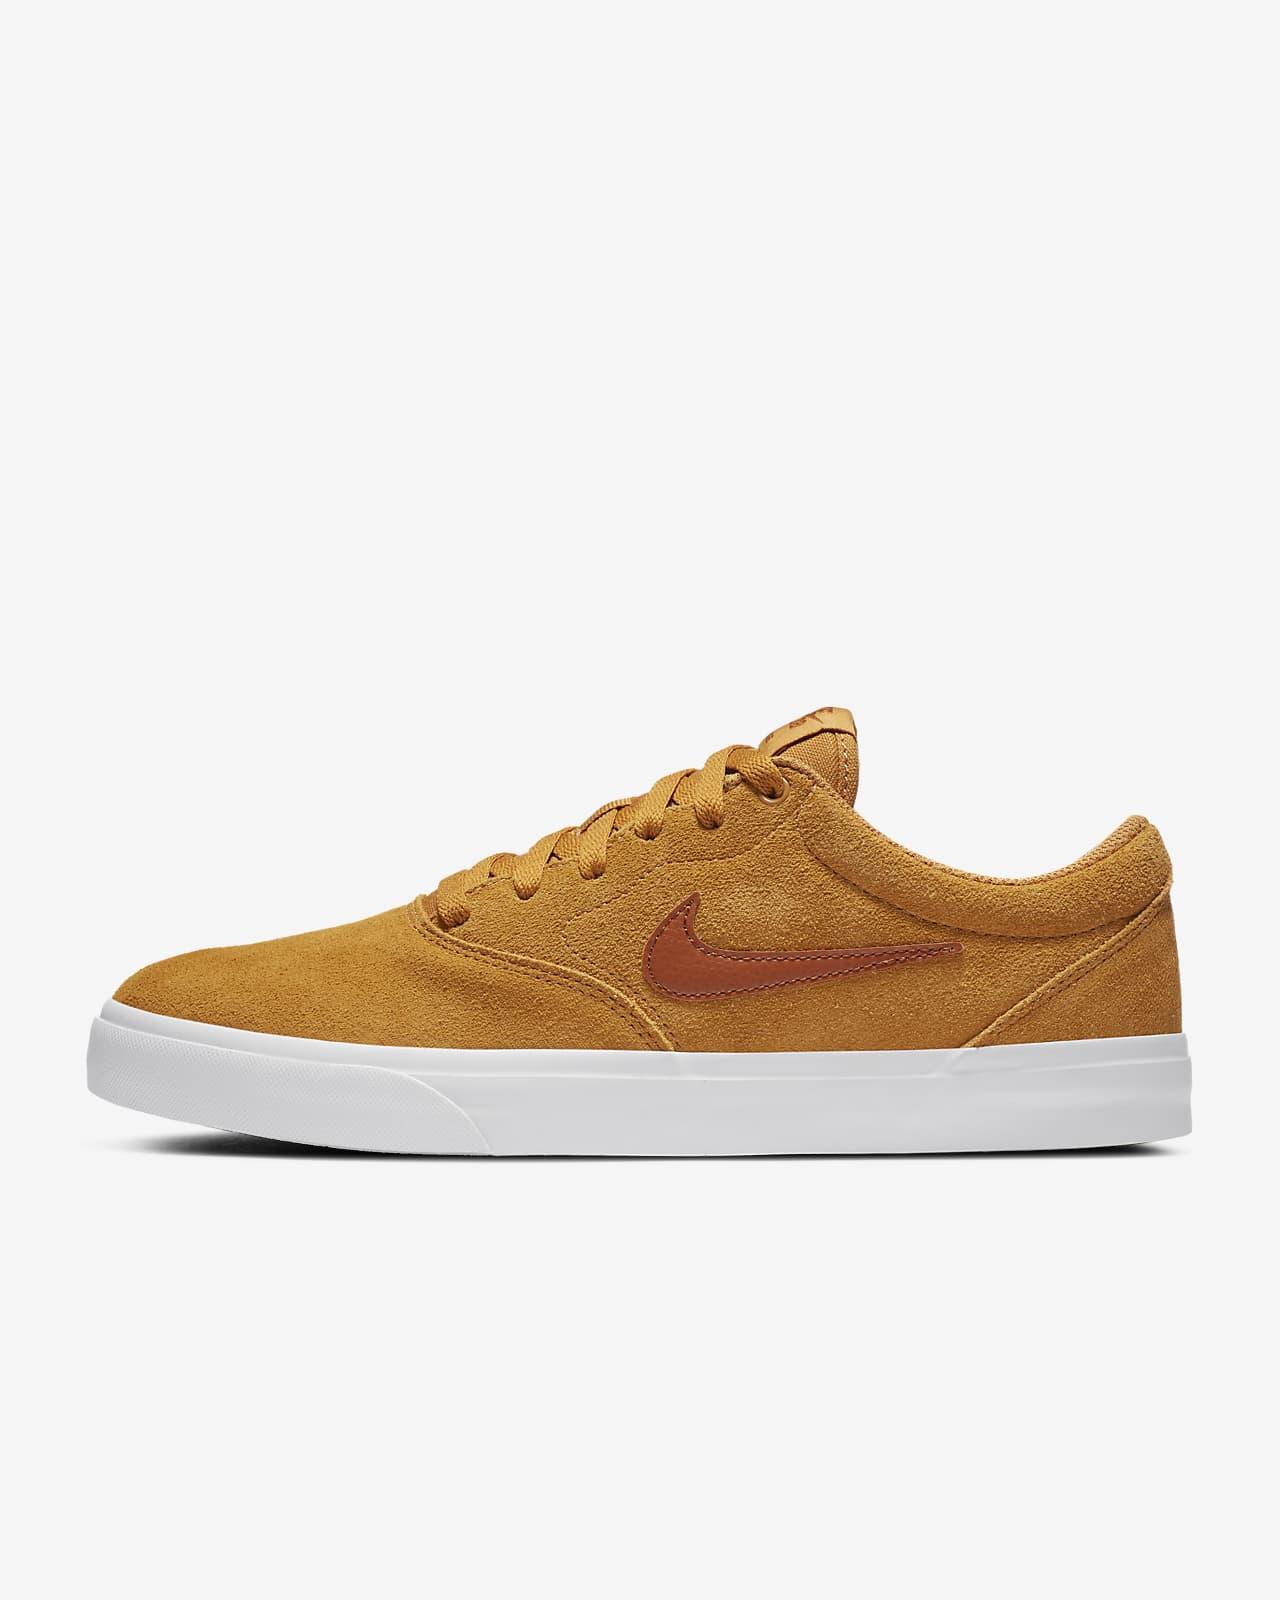 Sapatilhas de skateboard Nike SB Charge Suede